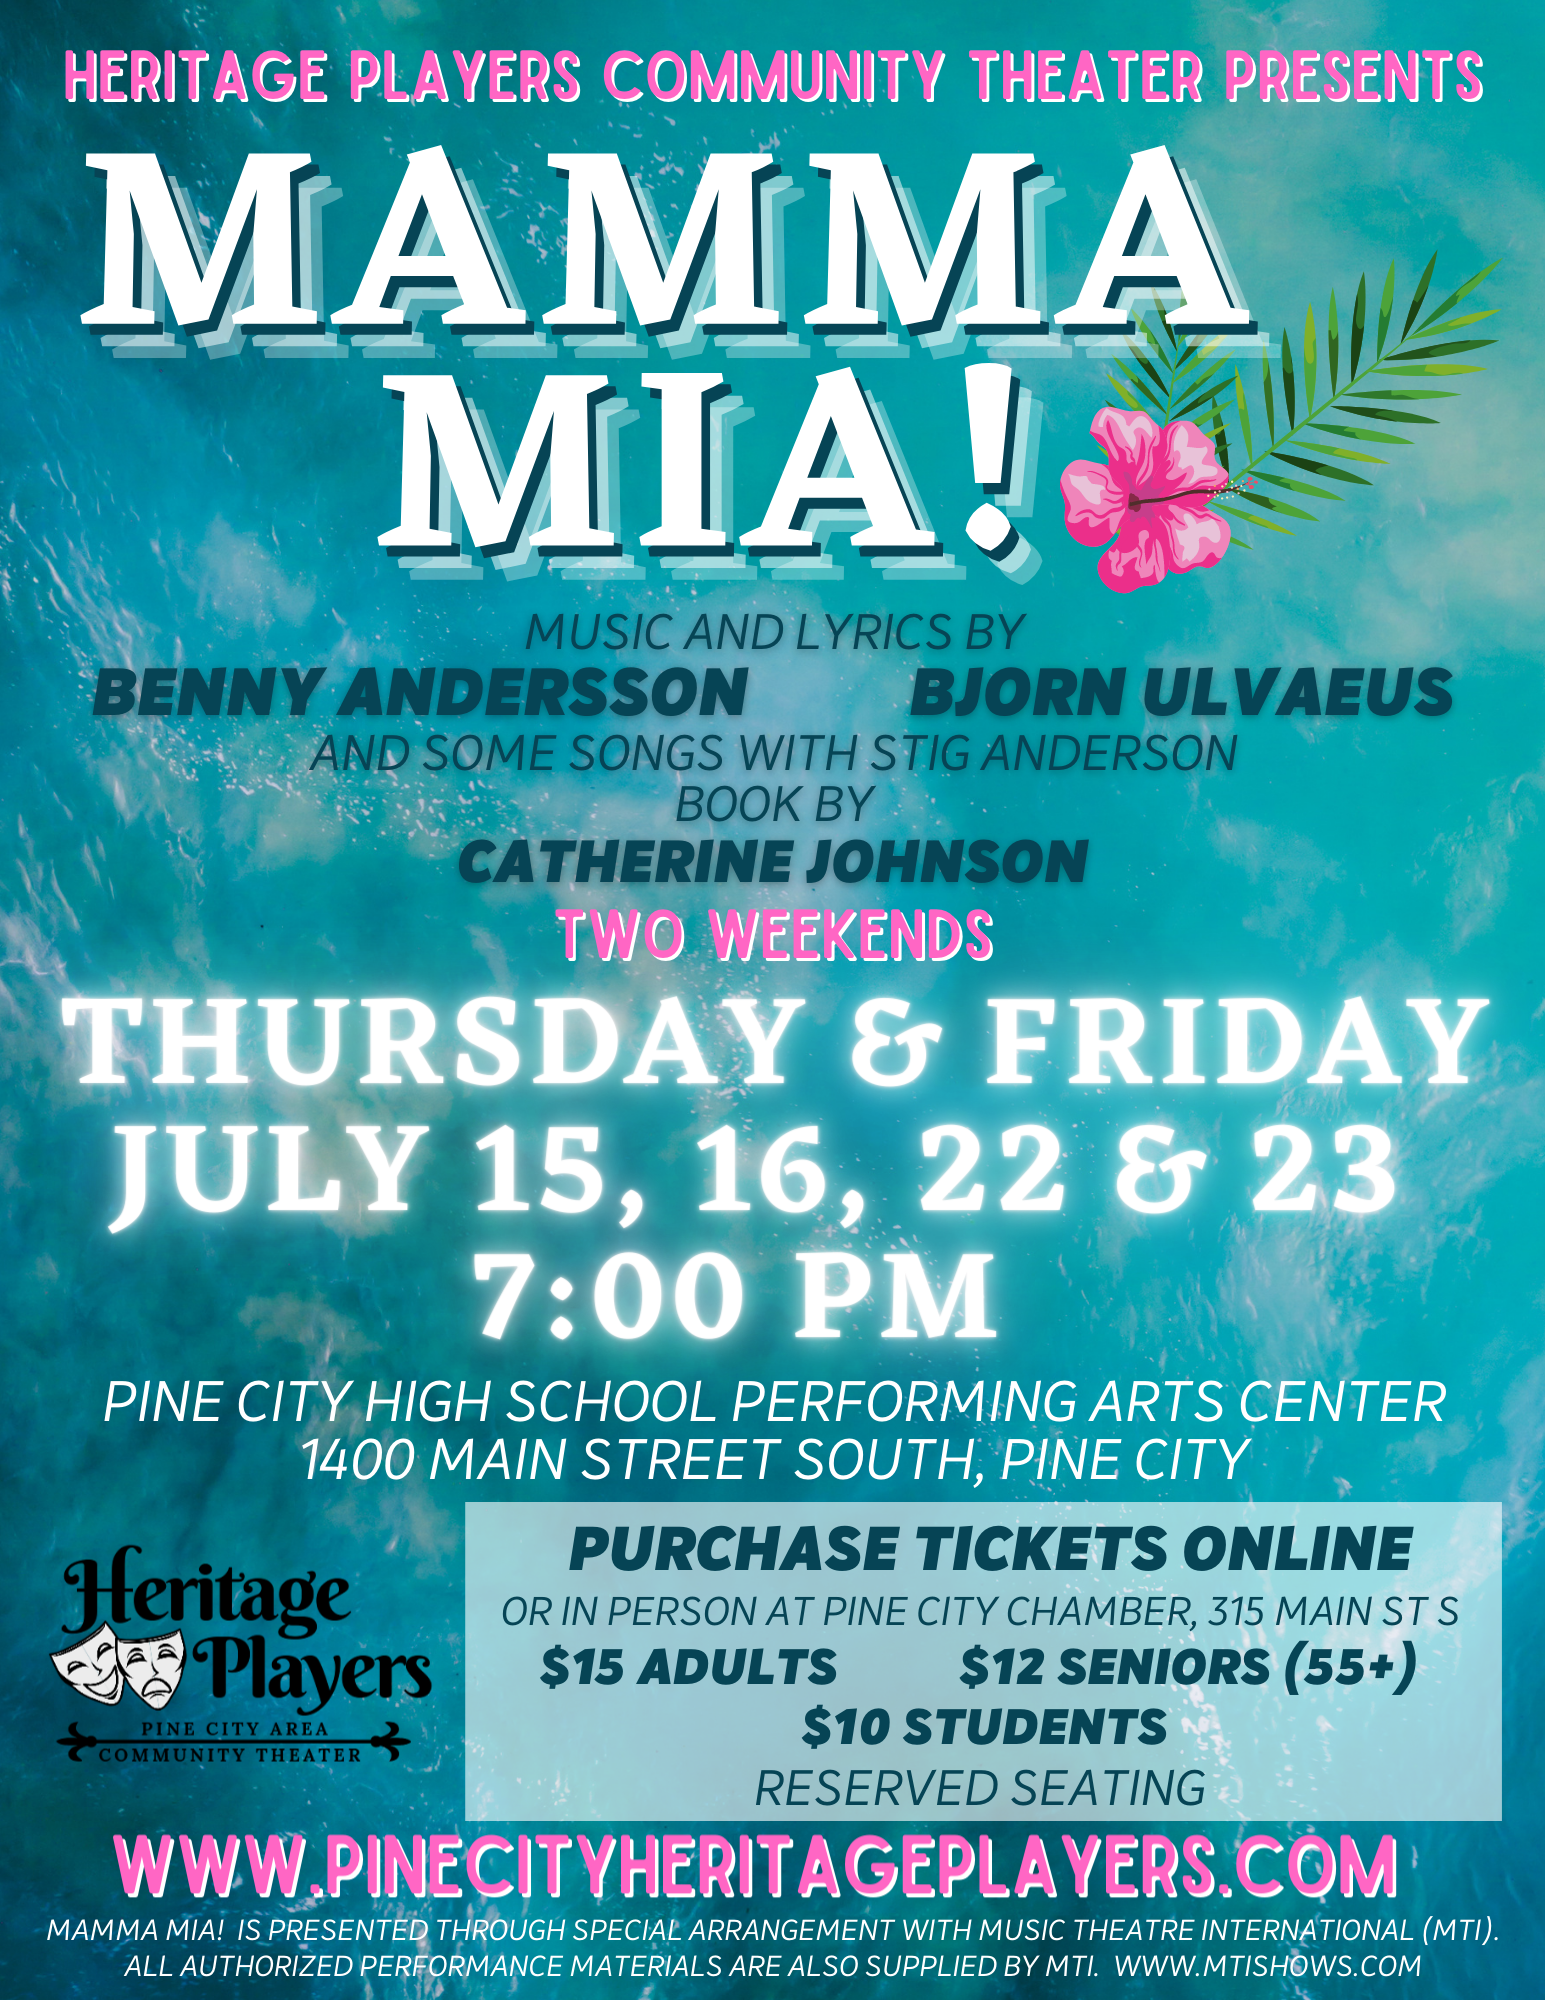 Mamma Mia Tickets on sale July 1st